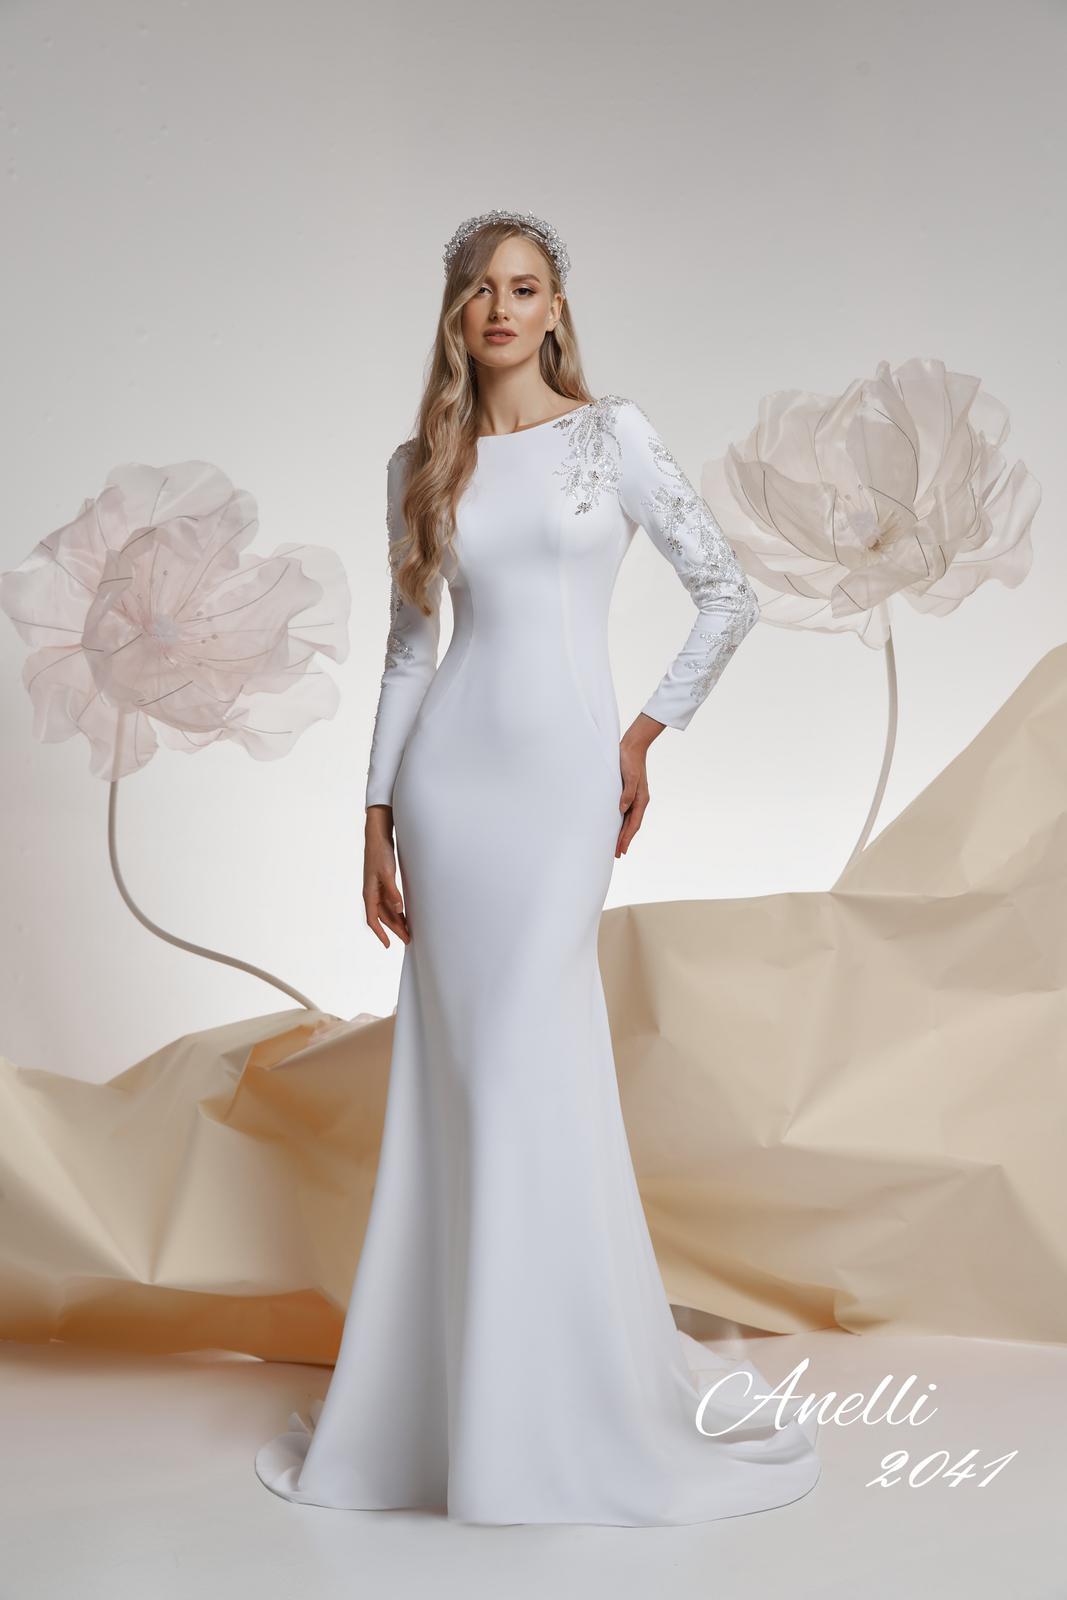 Svadobné šaty - Imagine 2041 - Obrázok č. 1